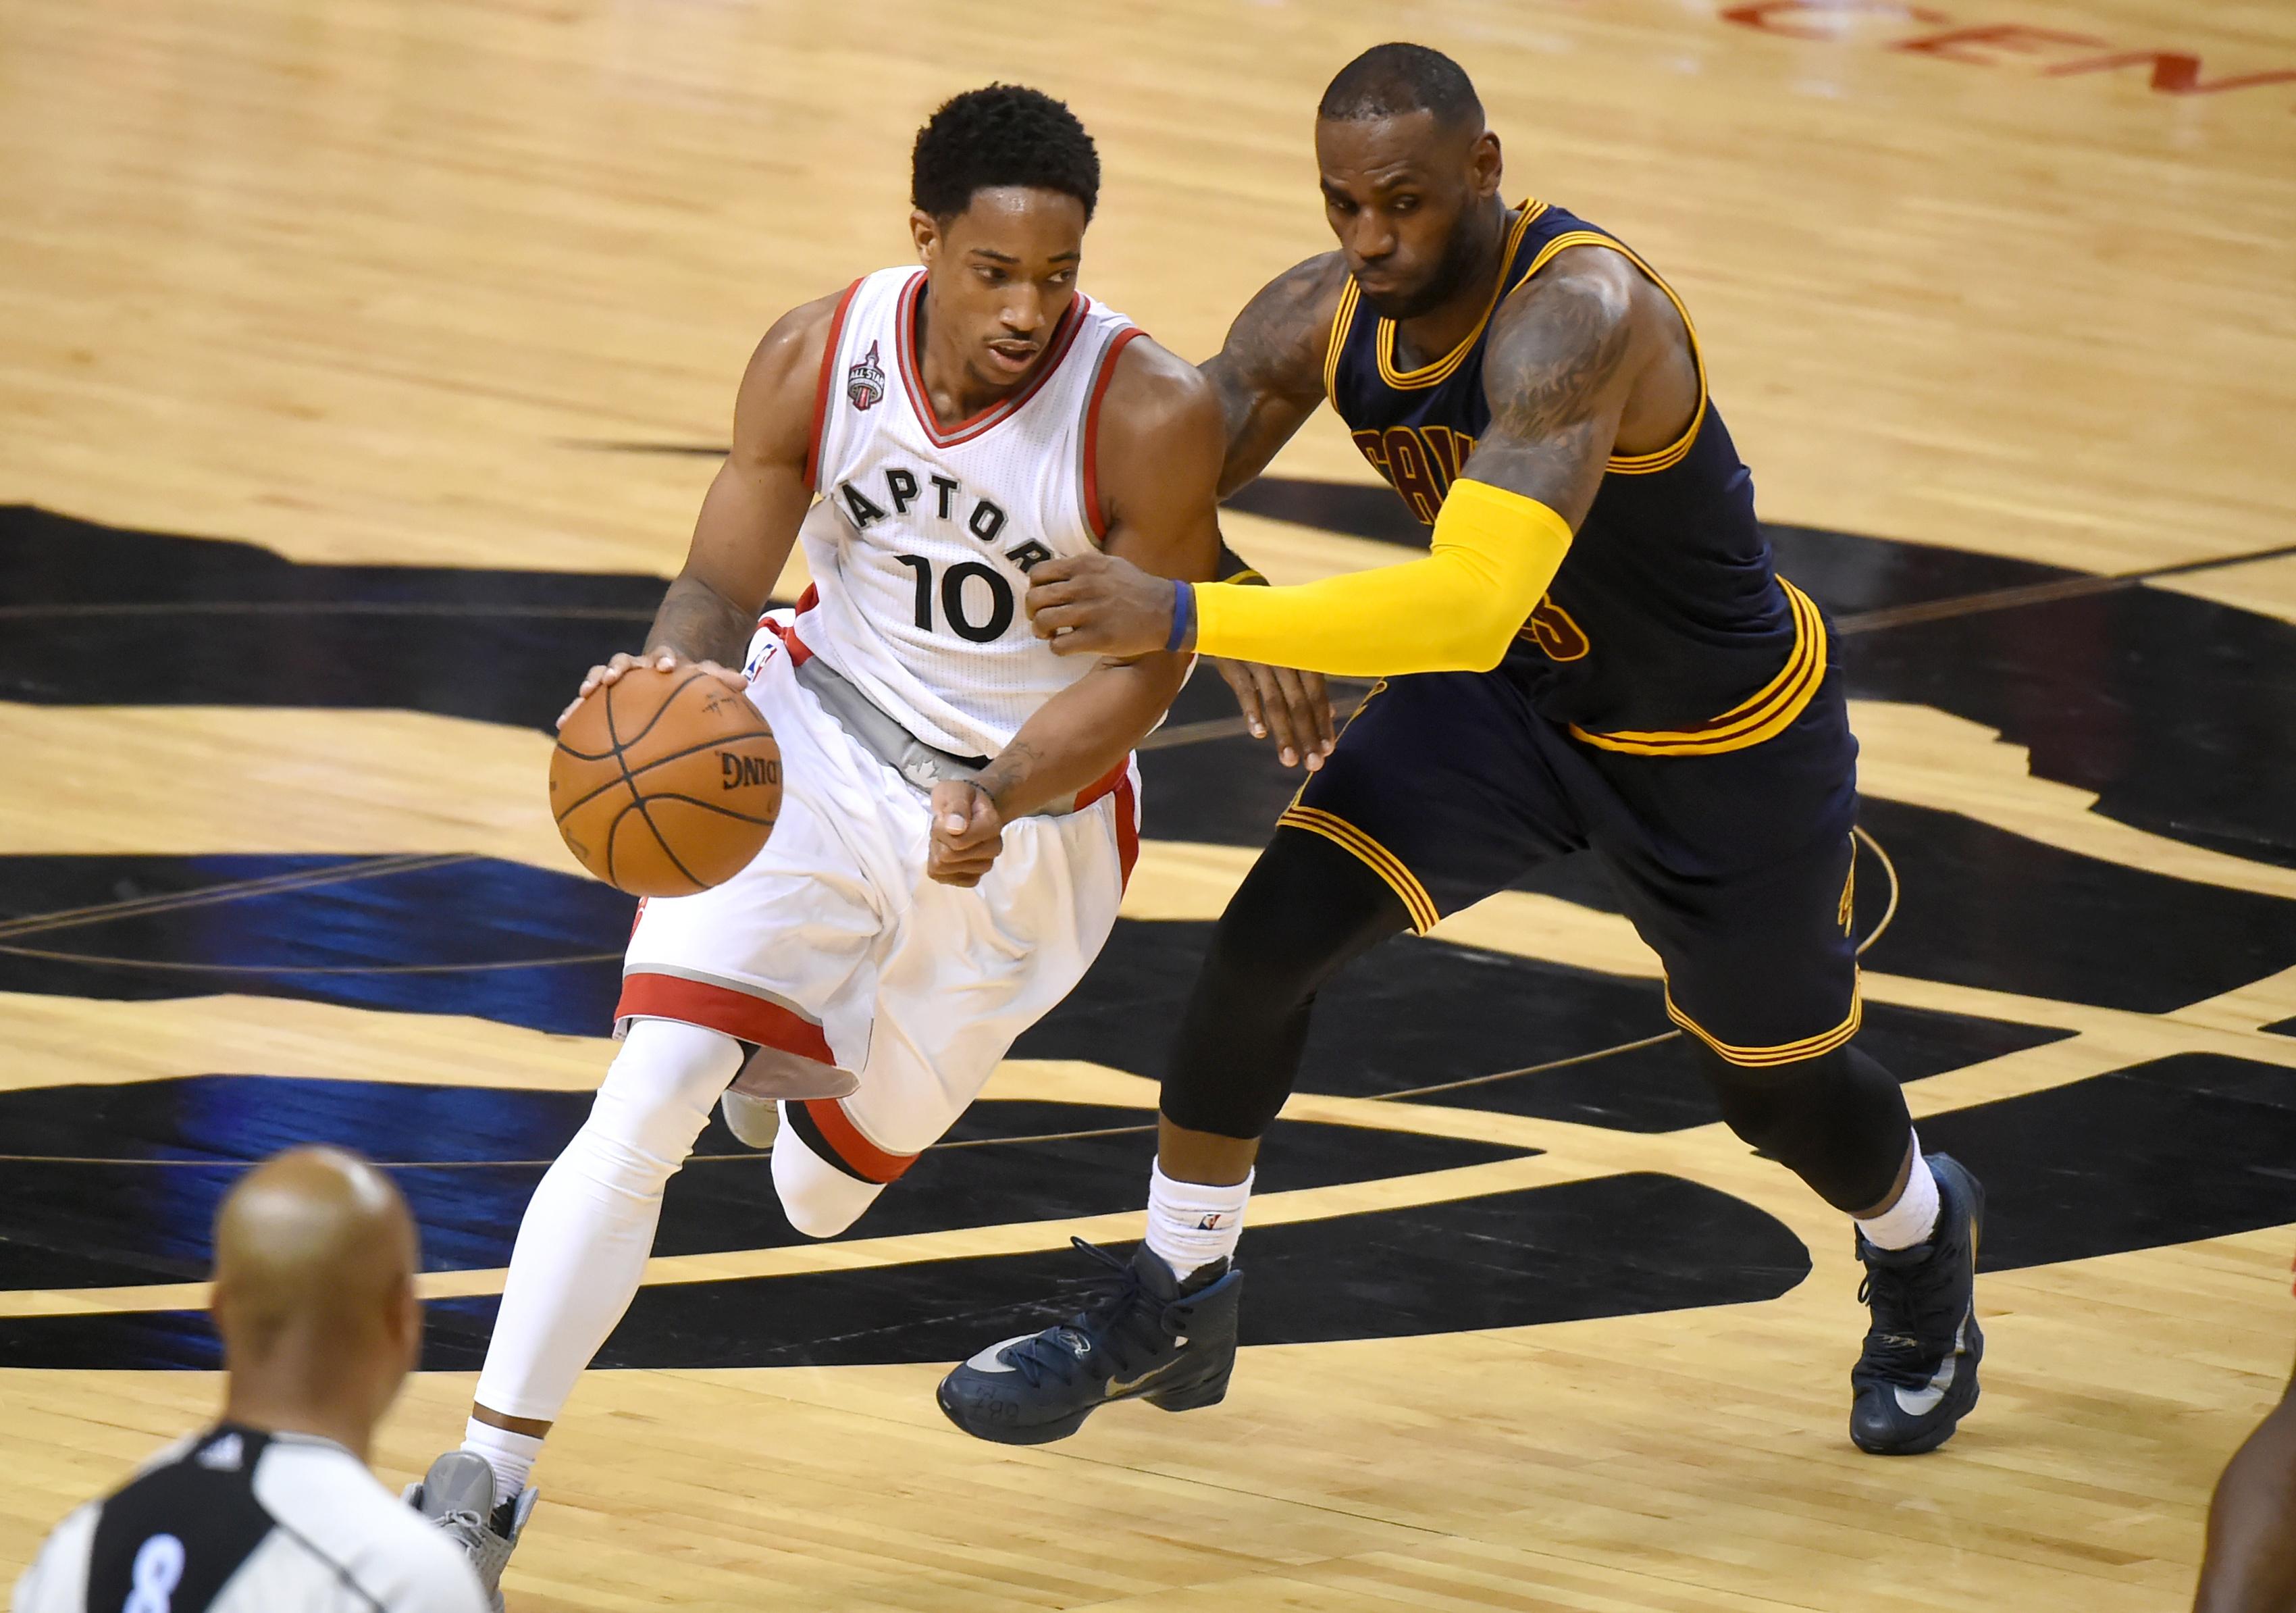 Tyronn Lue laments not calling enough plays for LeBron James